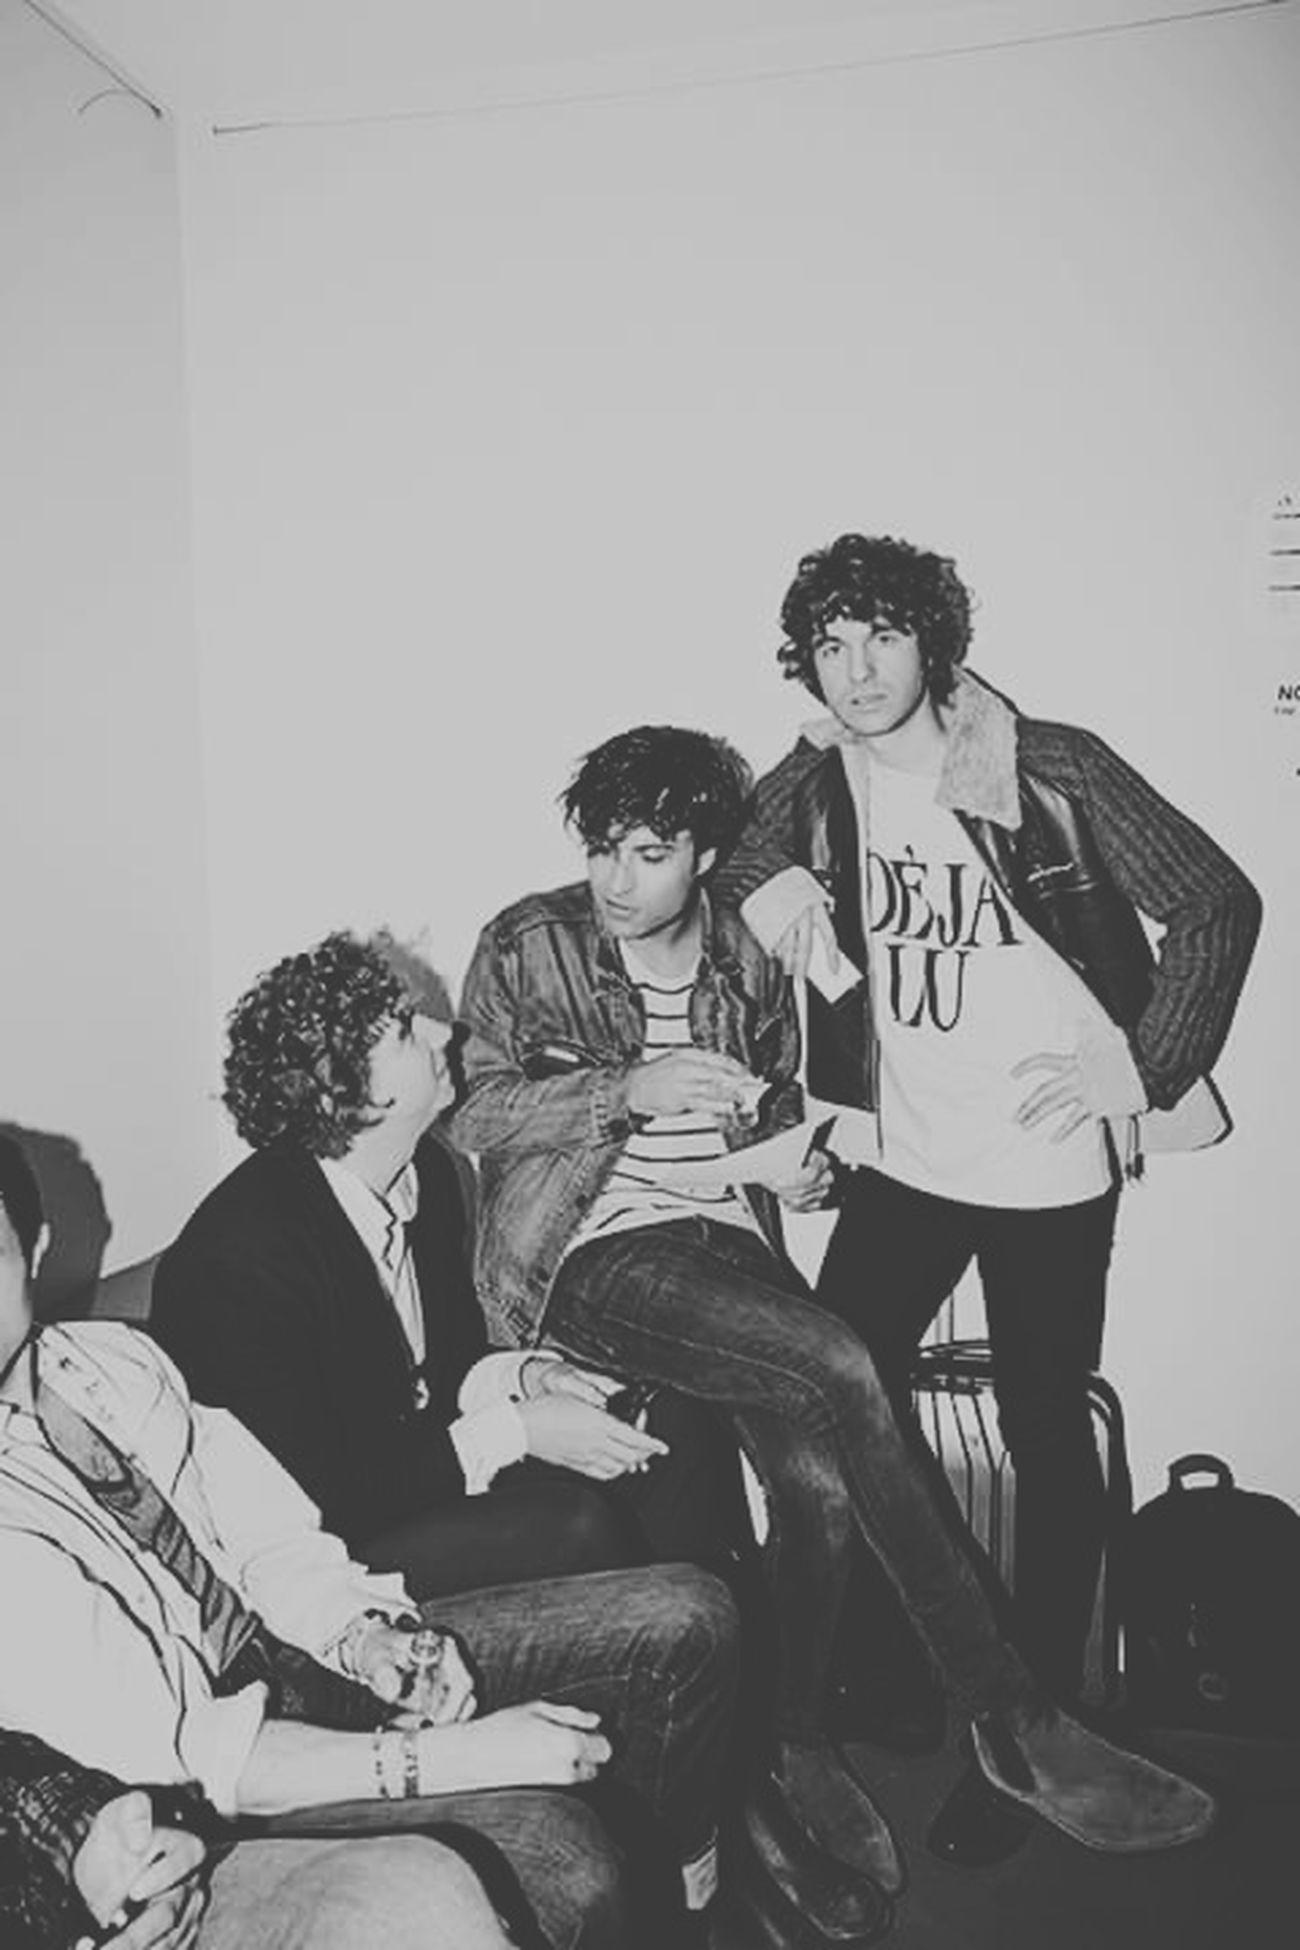 THE KOOKS ?❤Mi grupo favorito por siempre y para siempre (': ❤ The Kooks Mi Primer Grupo Favorito Mis Chicos ♡